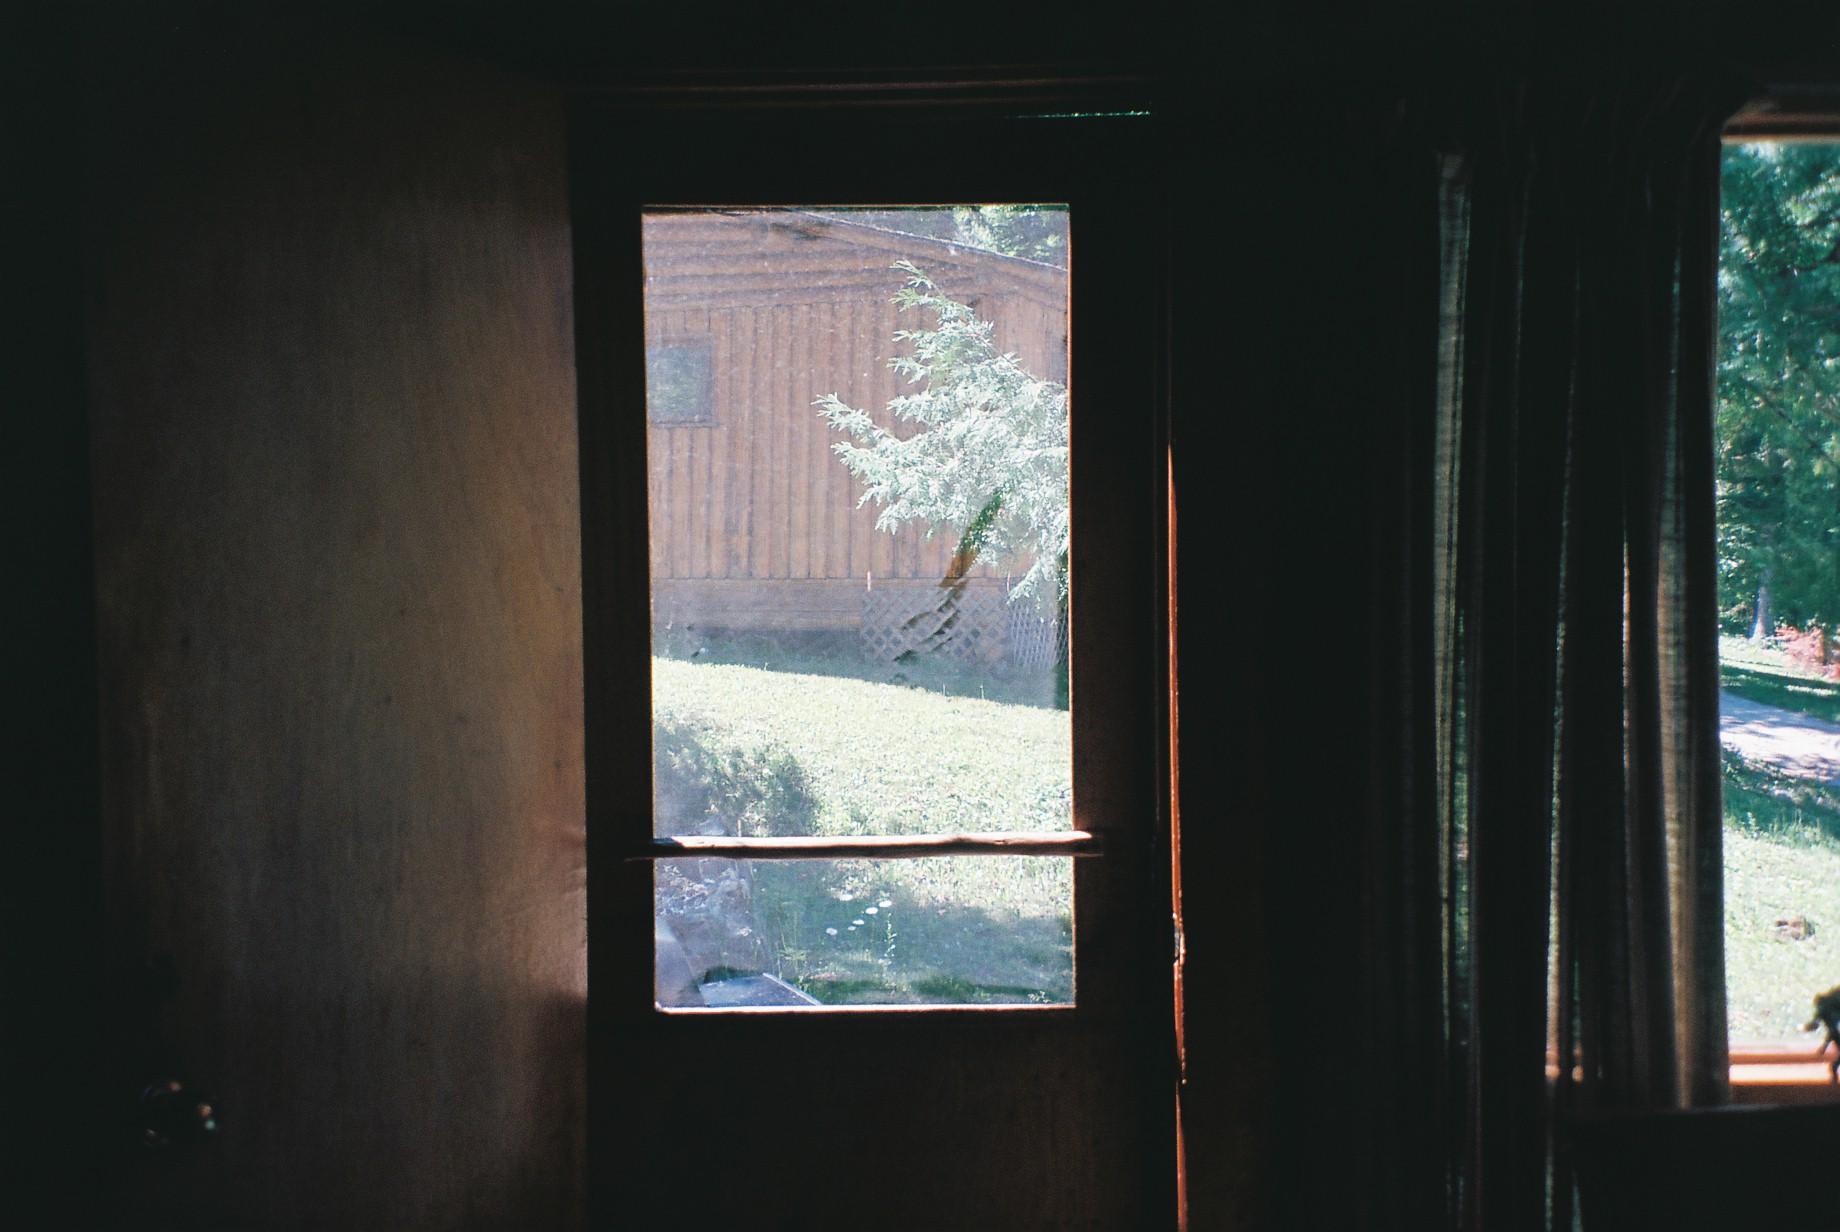 untitled shoot-3710060.JPG